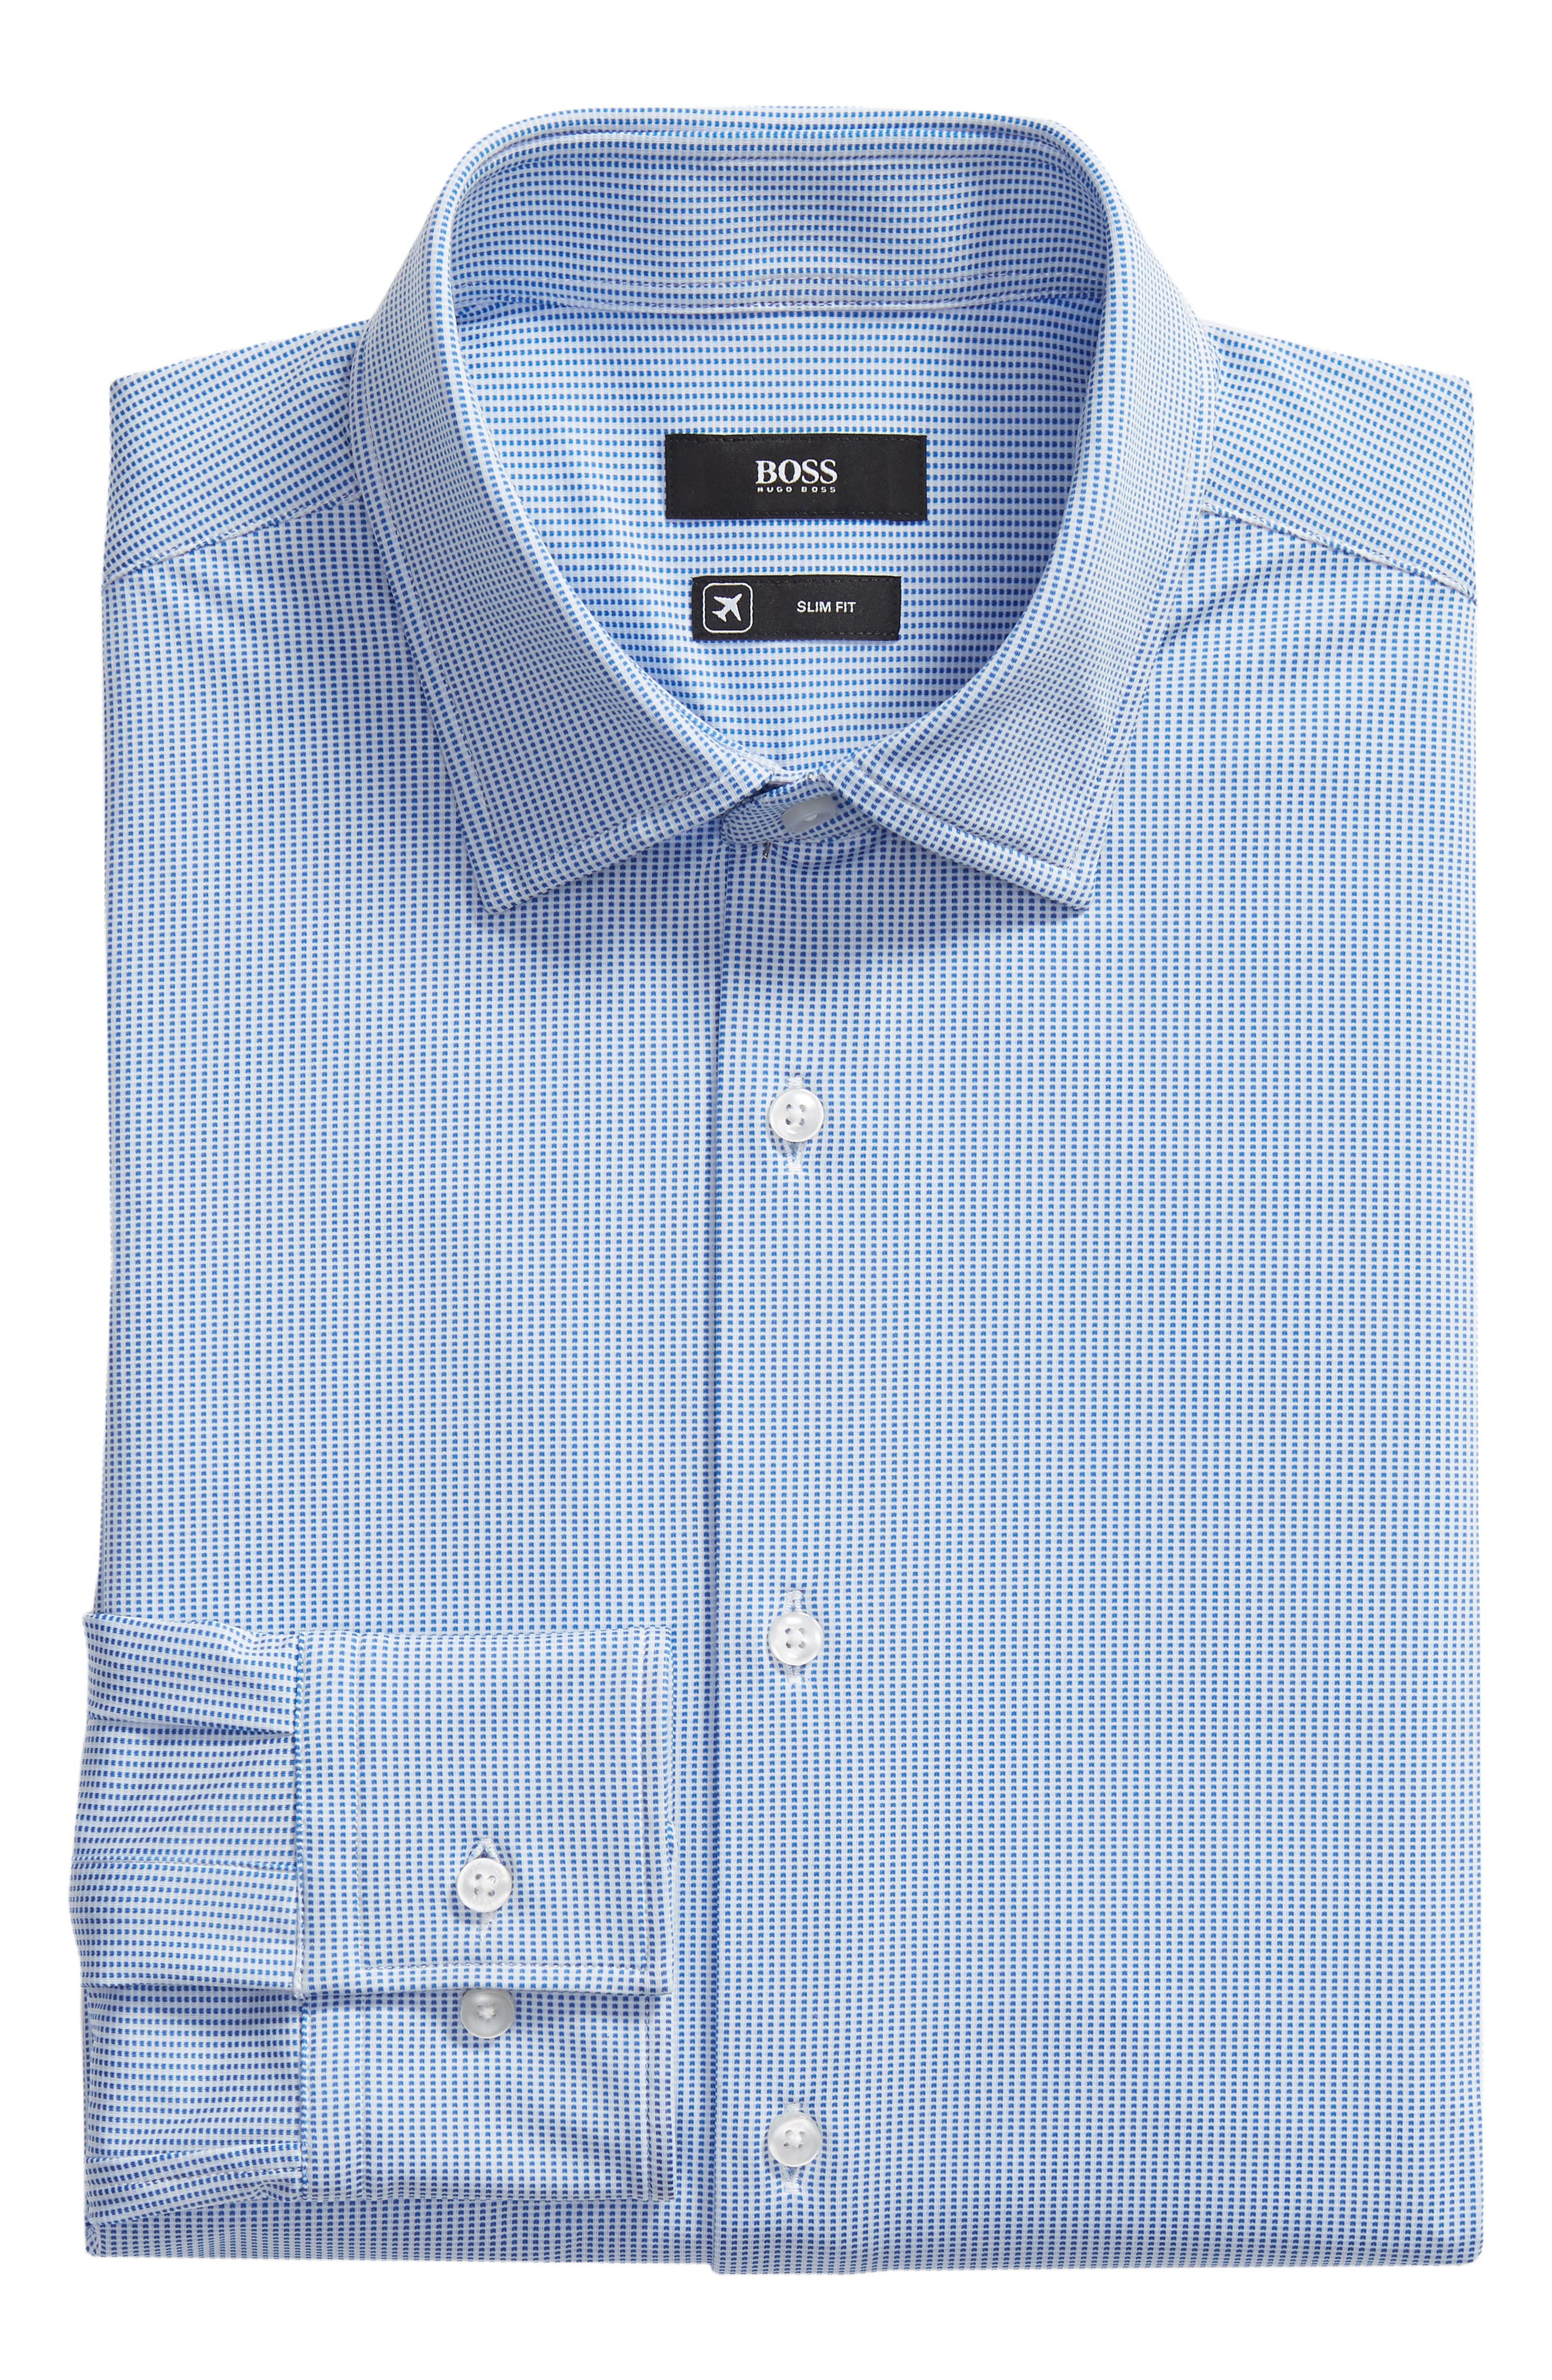 Jenno Slim Fit Stretch Check Dress Shirt,                             Alternate thumbnail 5, color,                             BLUE